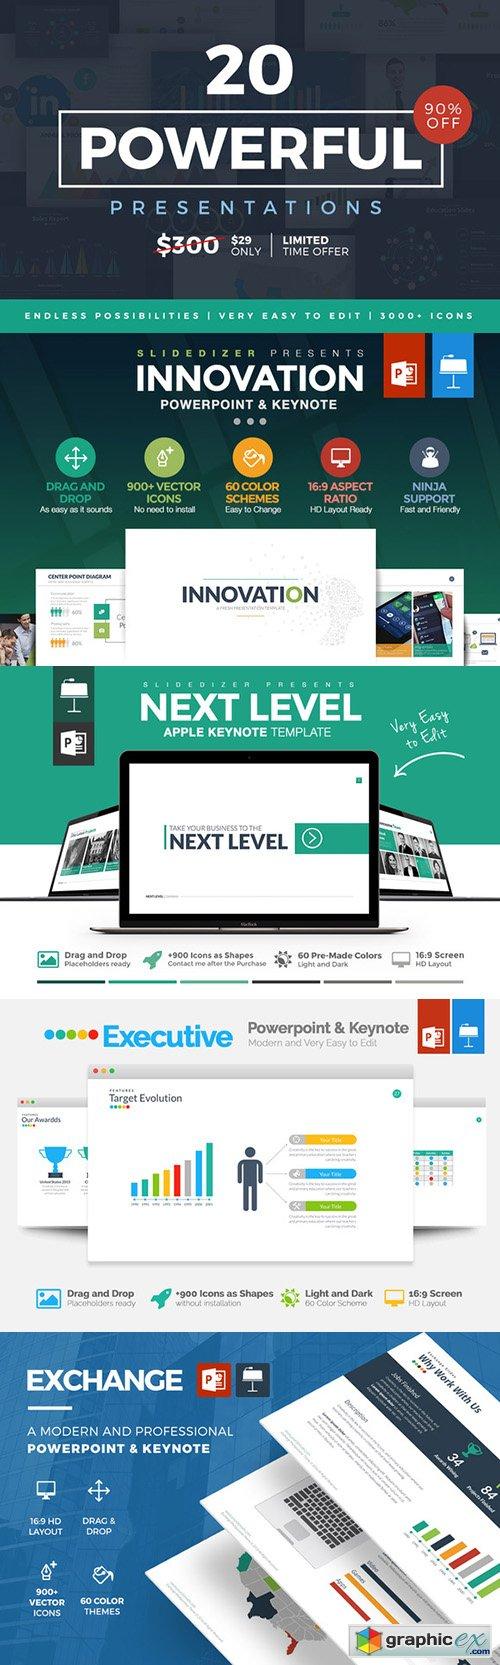 20 powerful presentations bundle free download vector stock image